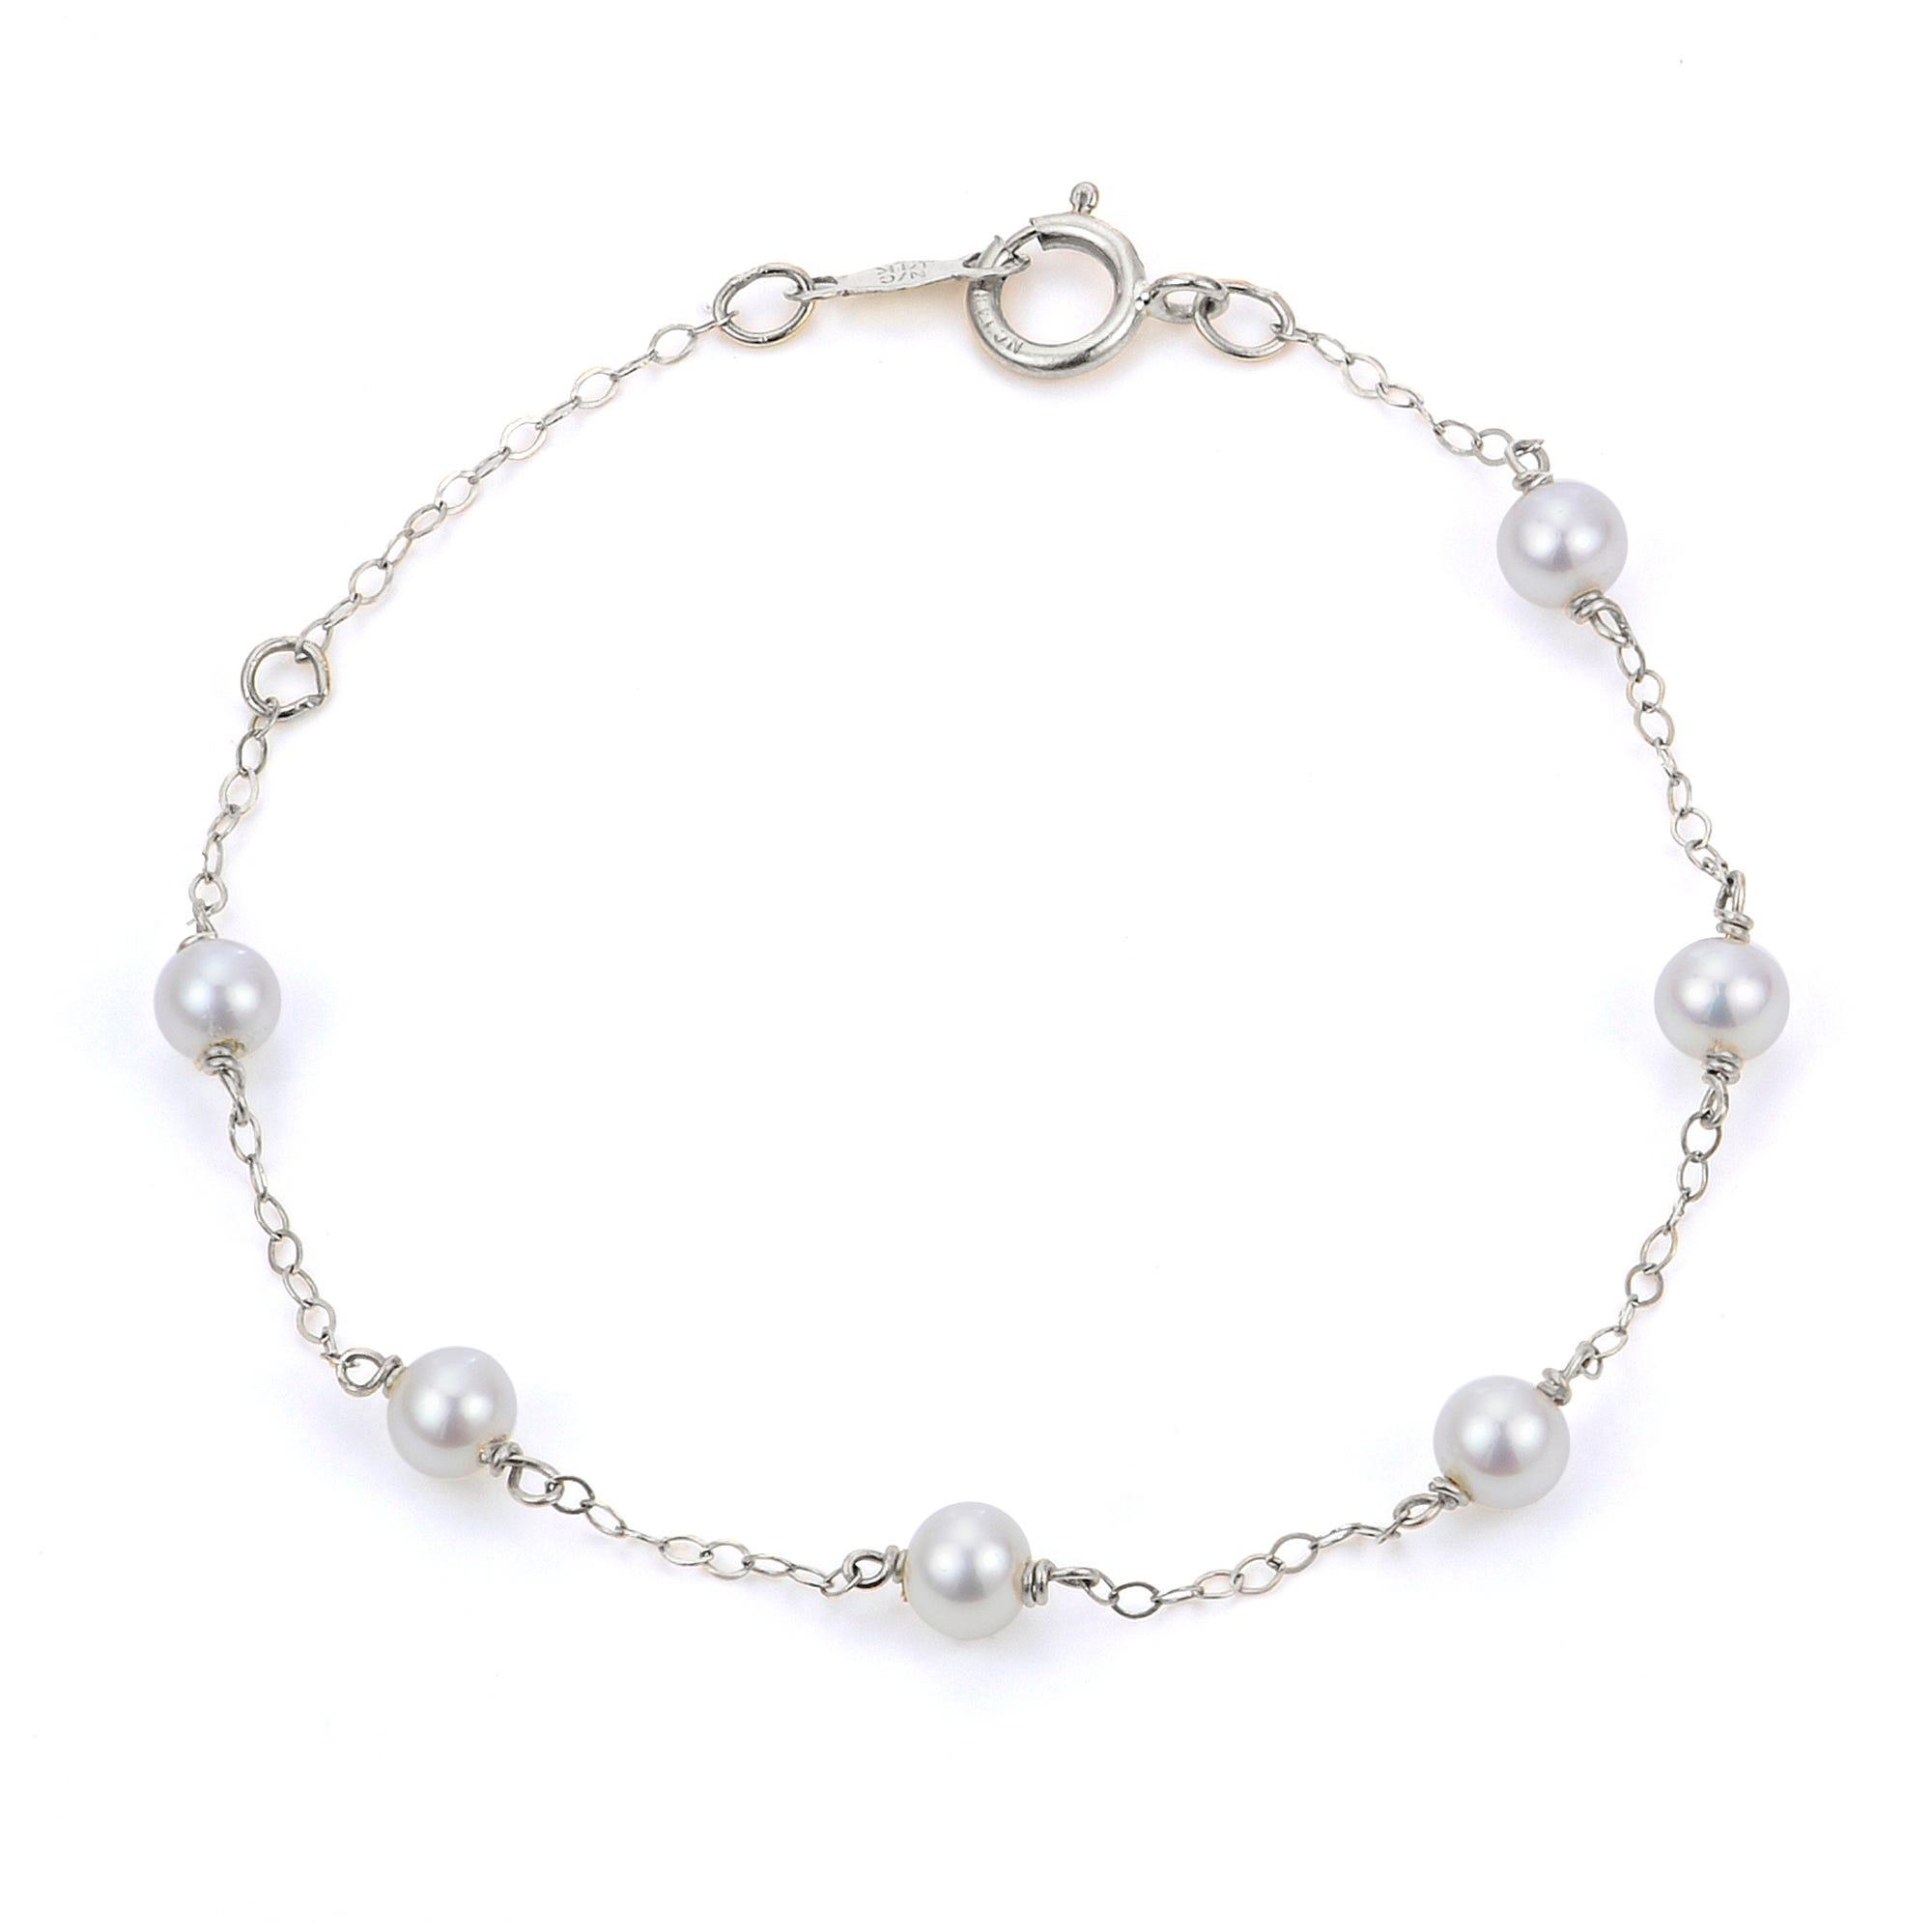 Freshwater Pearl Children's Bracelet in Sterling Silver